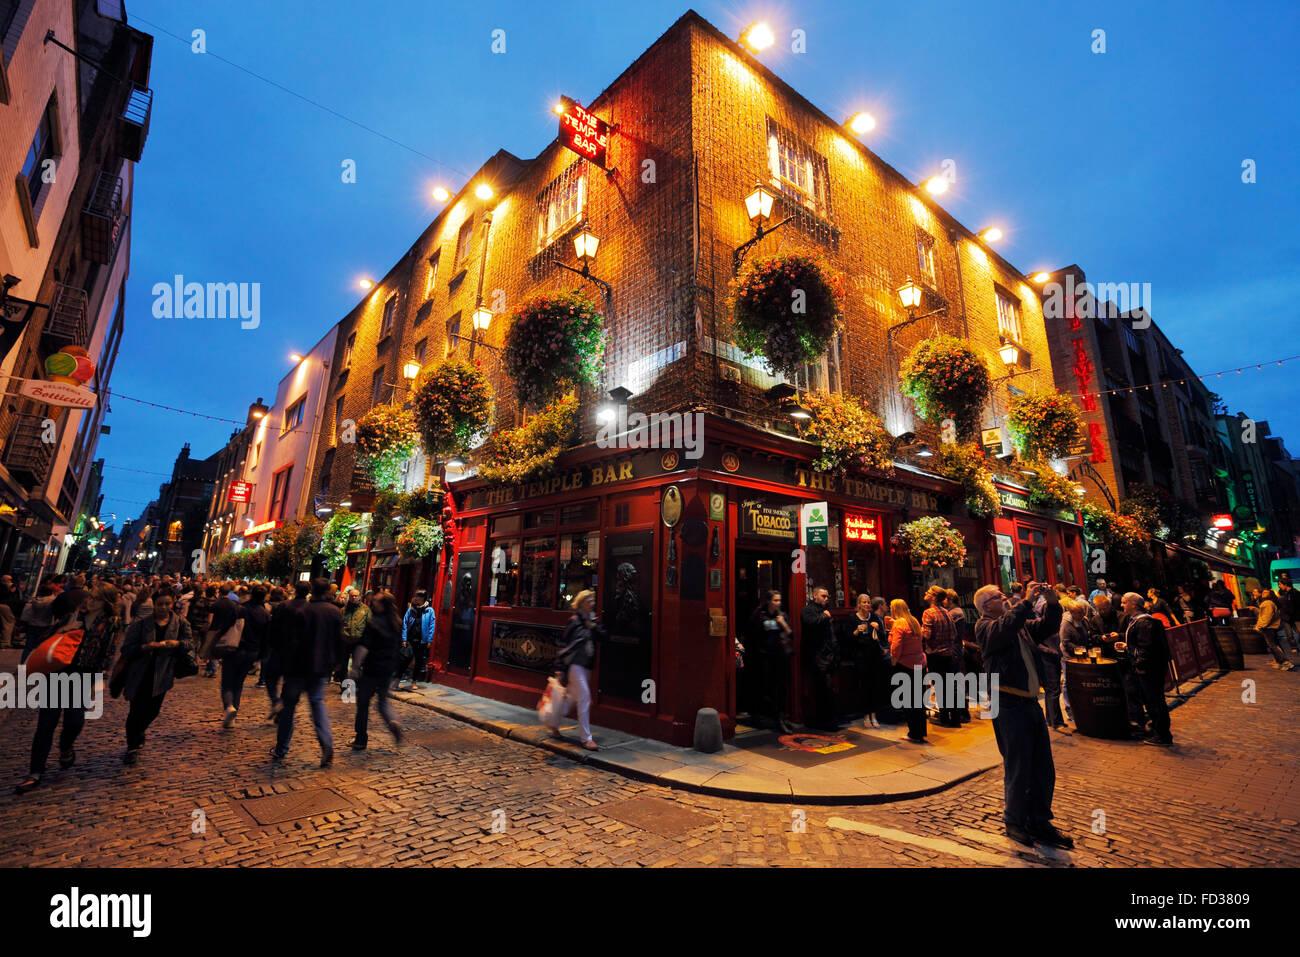 The Temple Bar in Dublin - Stock Image